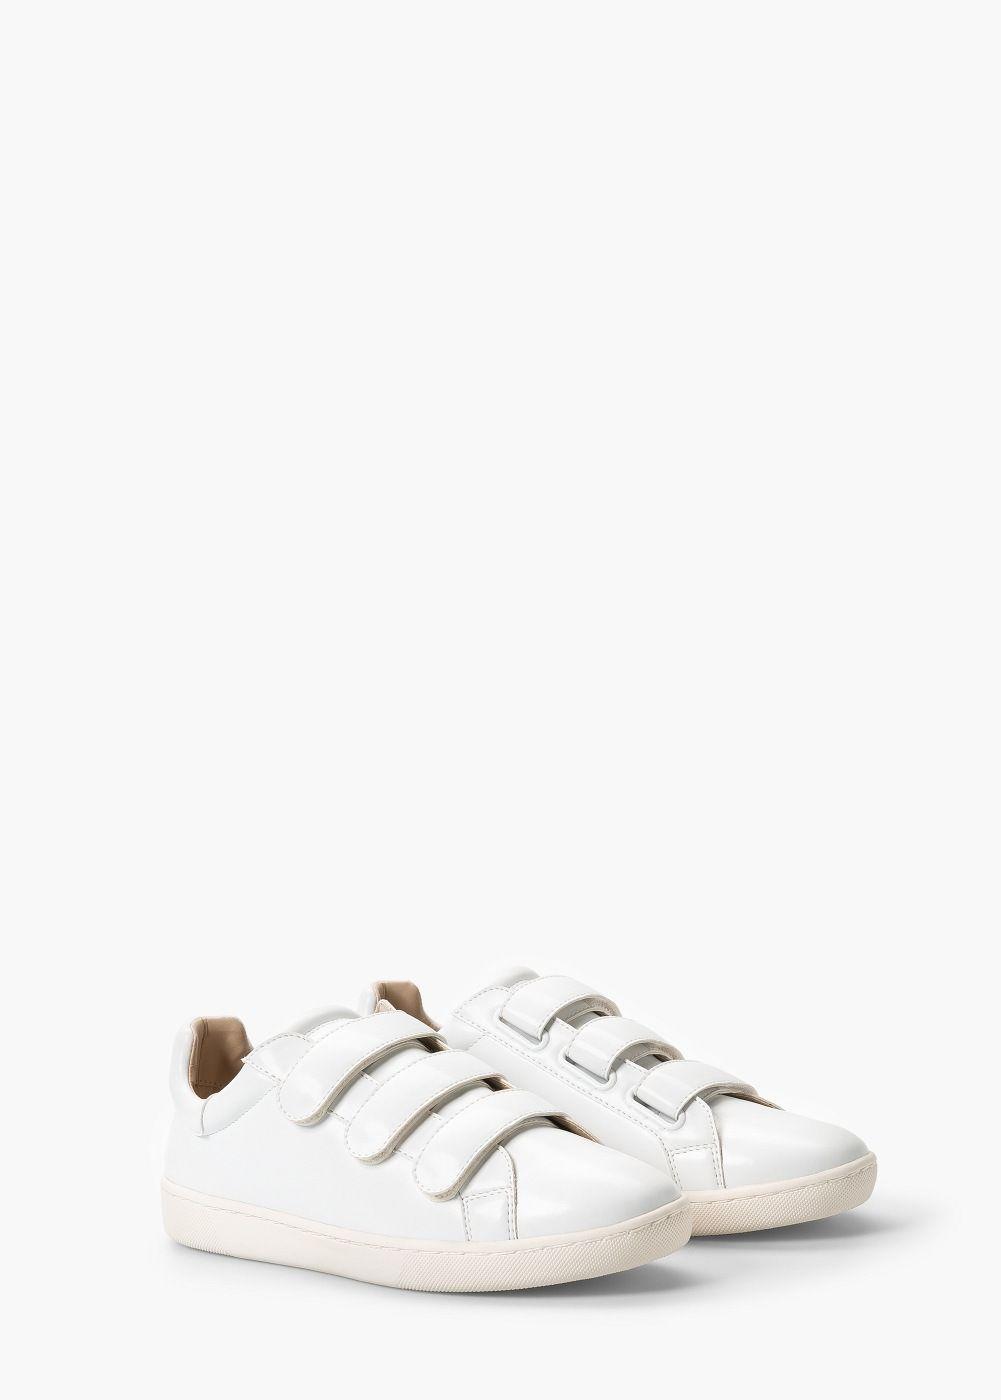 Sportschuhe Mit Klettverschluss Damen Mango Deutschland Sneakers Womens Sneakers Me Too Shoes